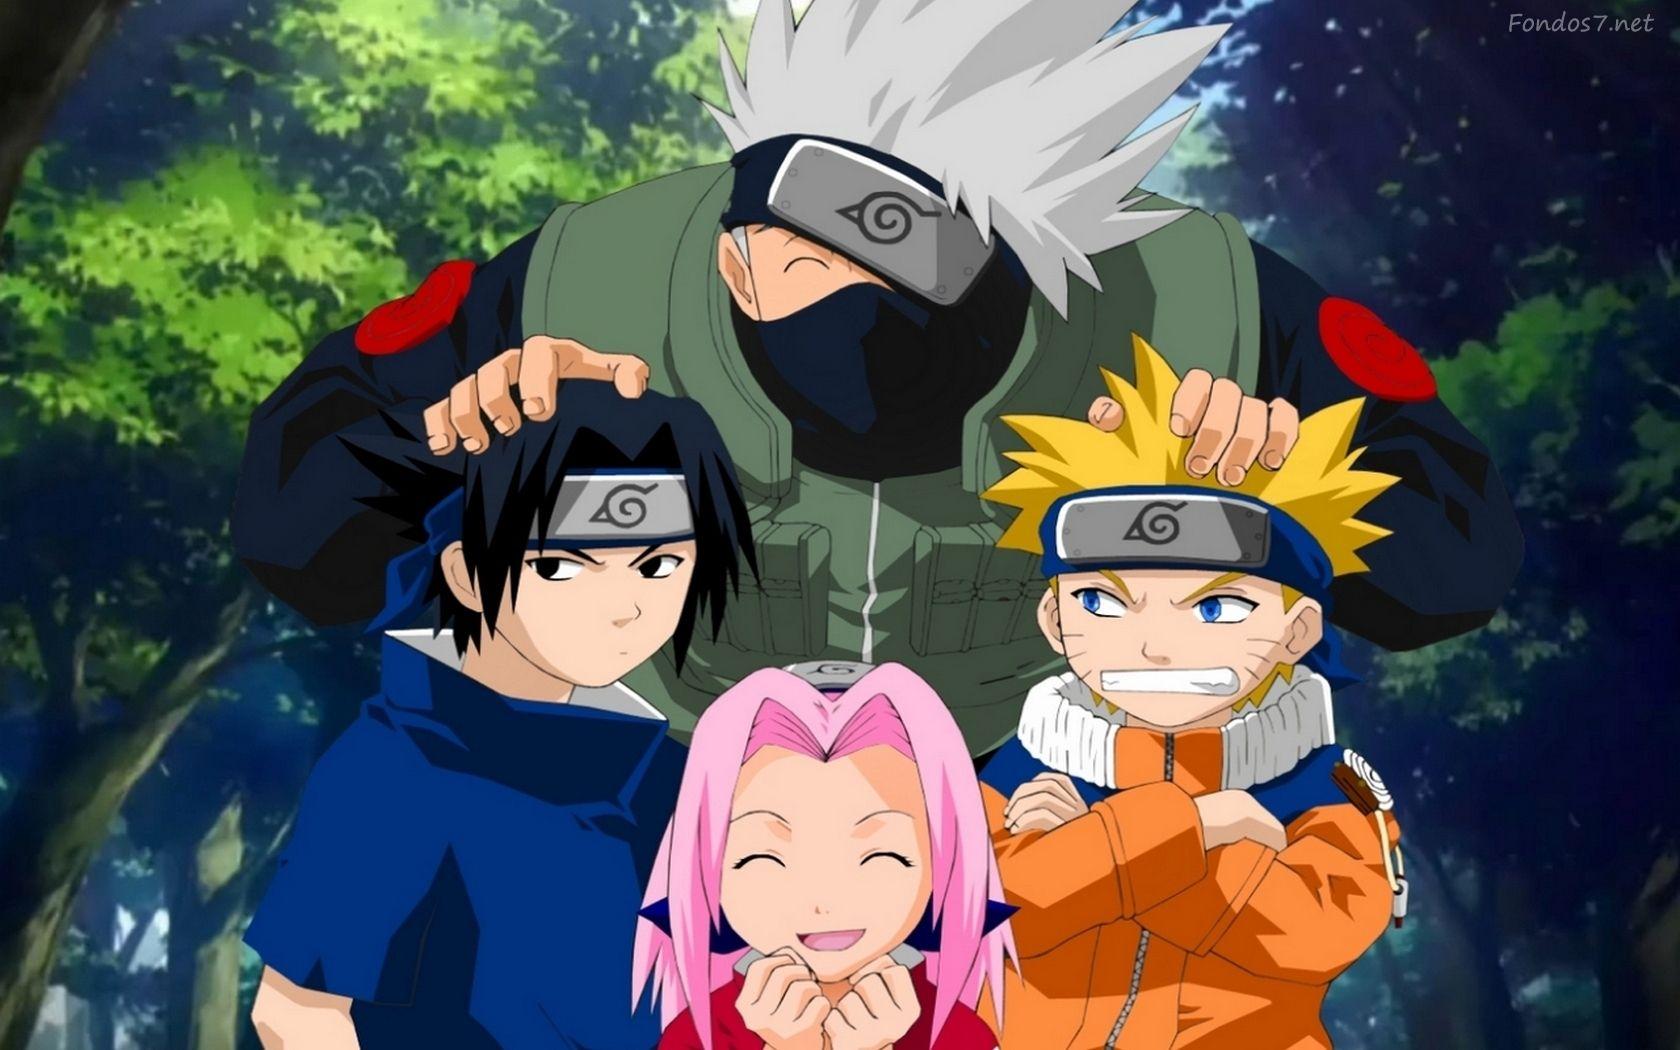 Top Wallpaper Naruto Team 7 - 3c545c5f582b9d10746385b24d45b35c  Perfect Image Reference.jpg